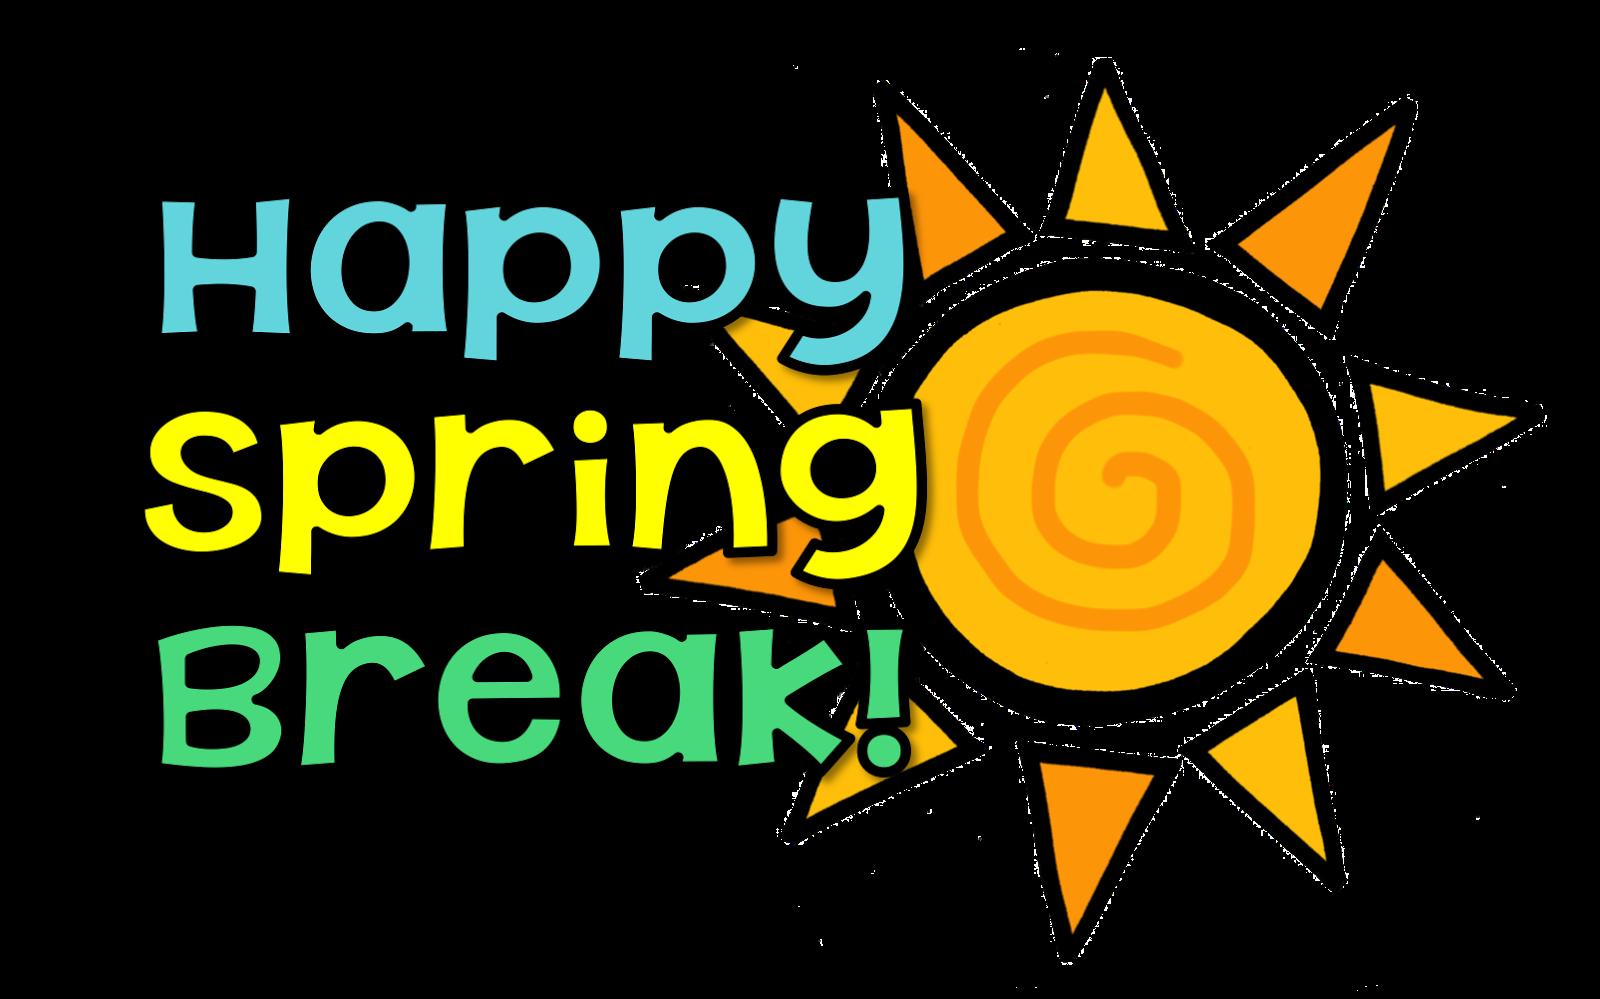 School homework clipart free Spring Break!   Juarez-Lincoln Elementary School free